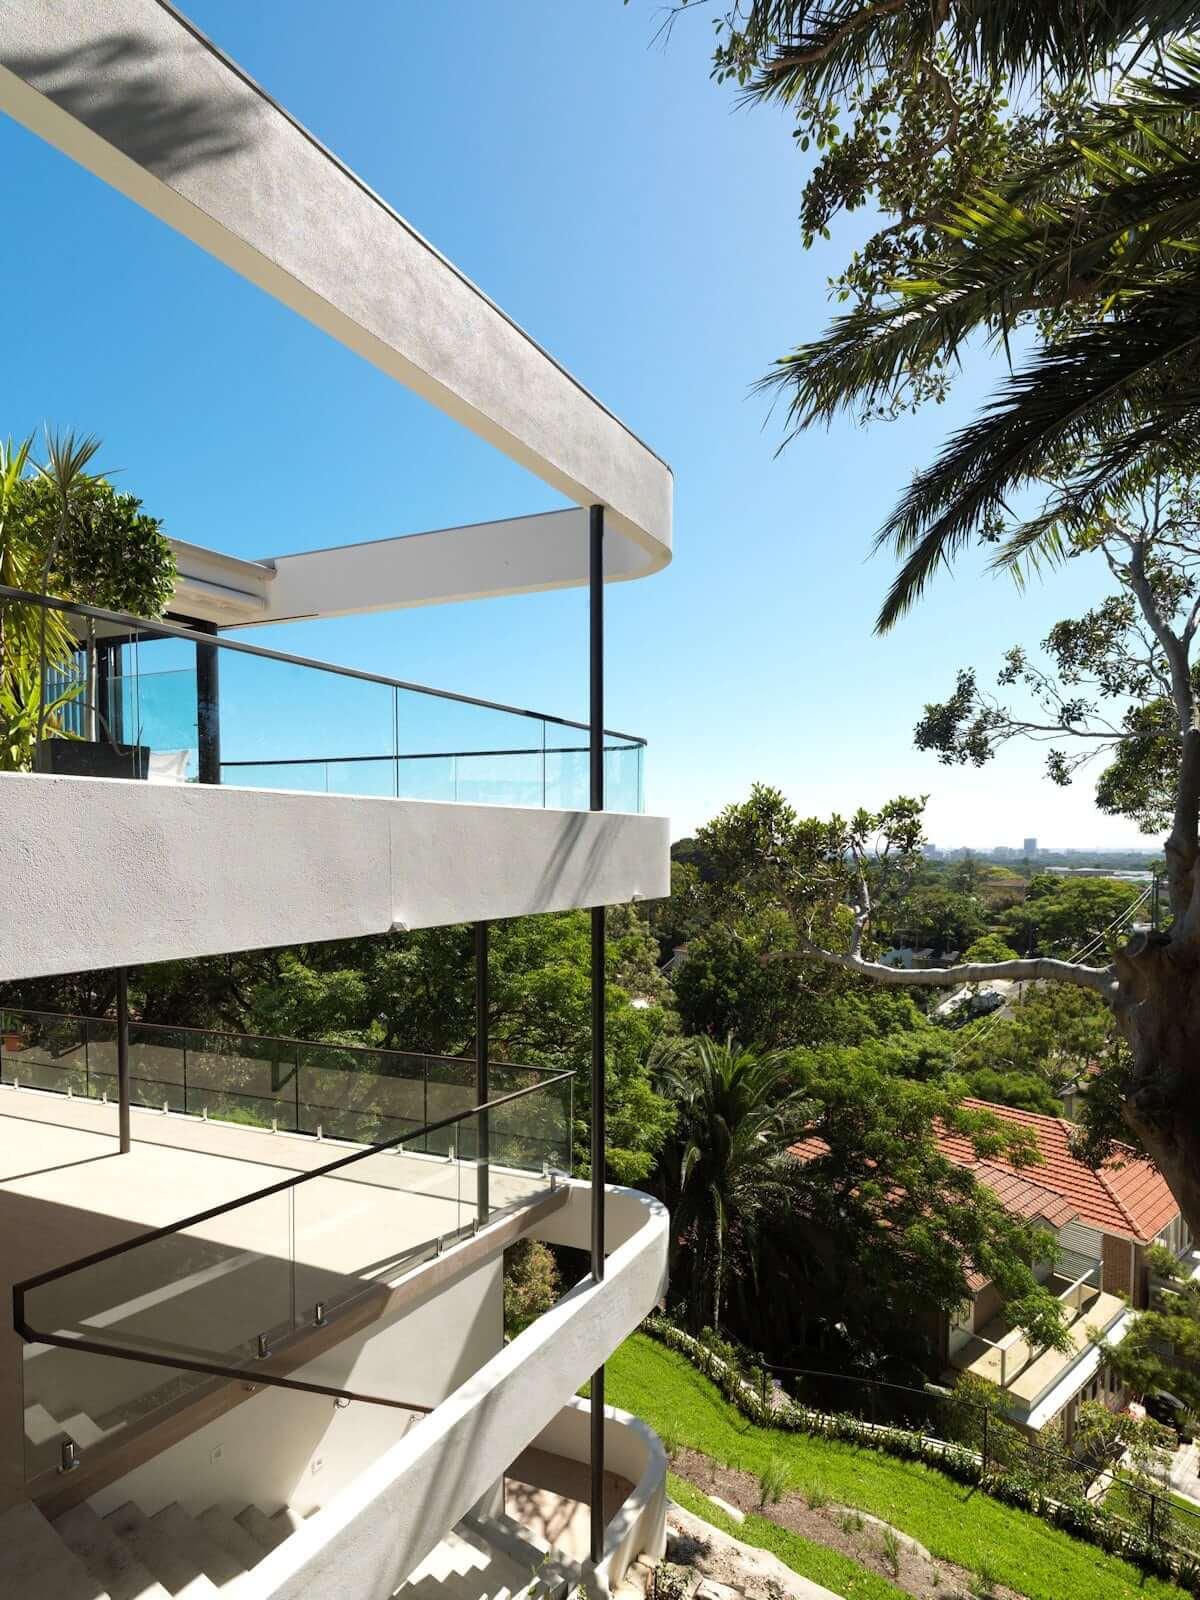 Luigi Rosselli Architects